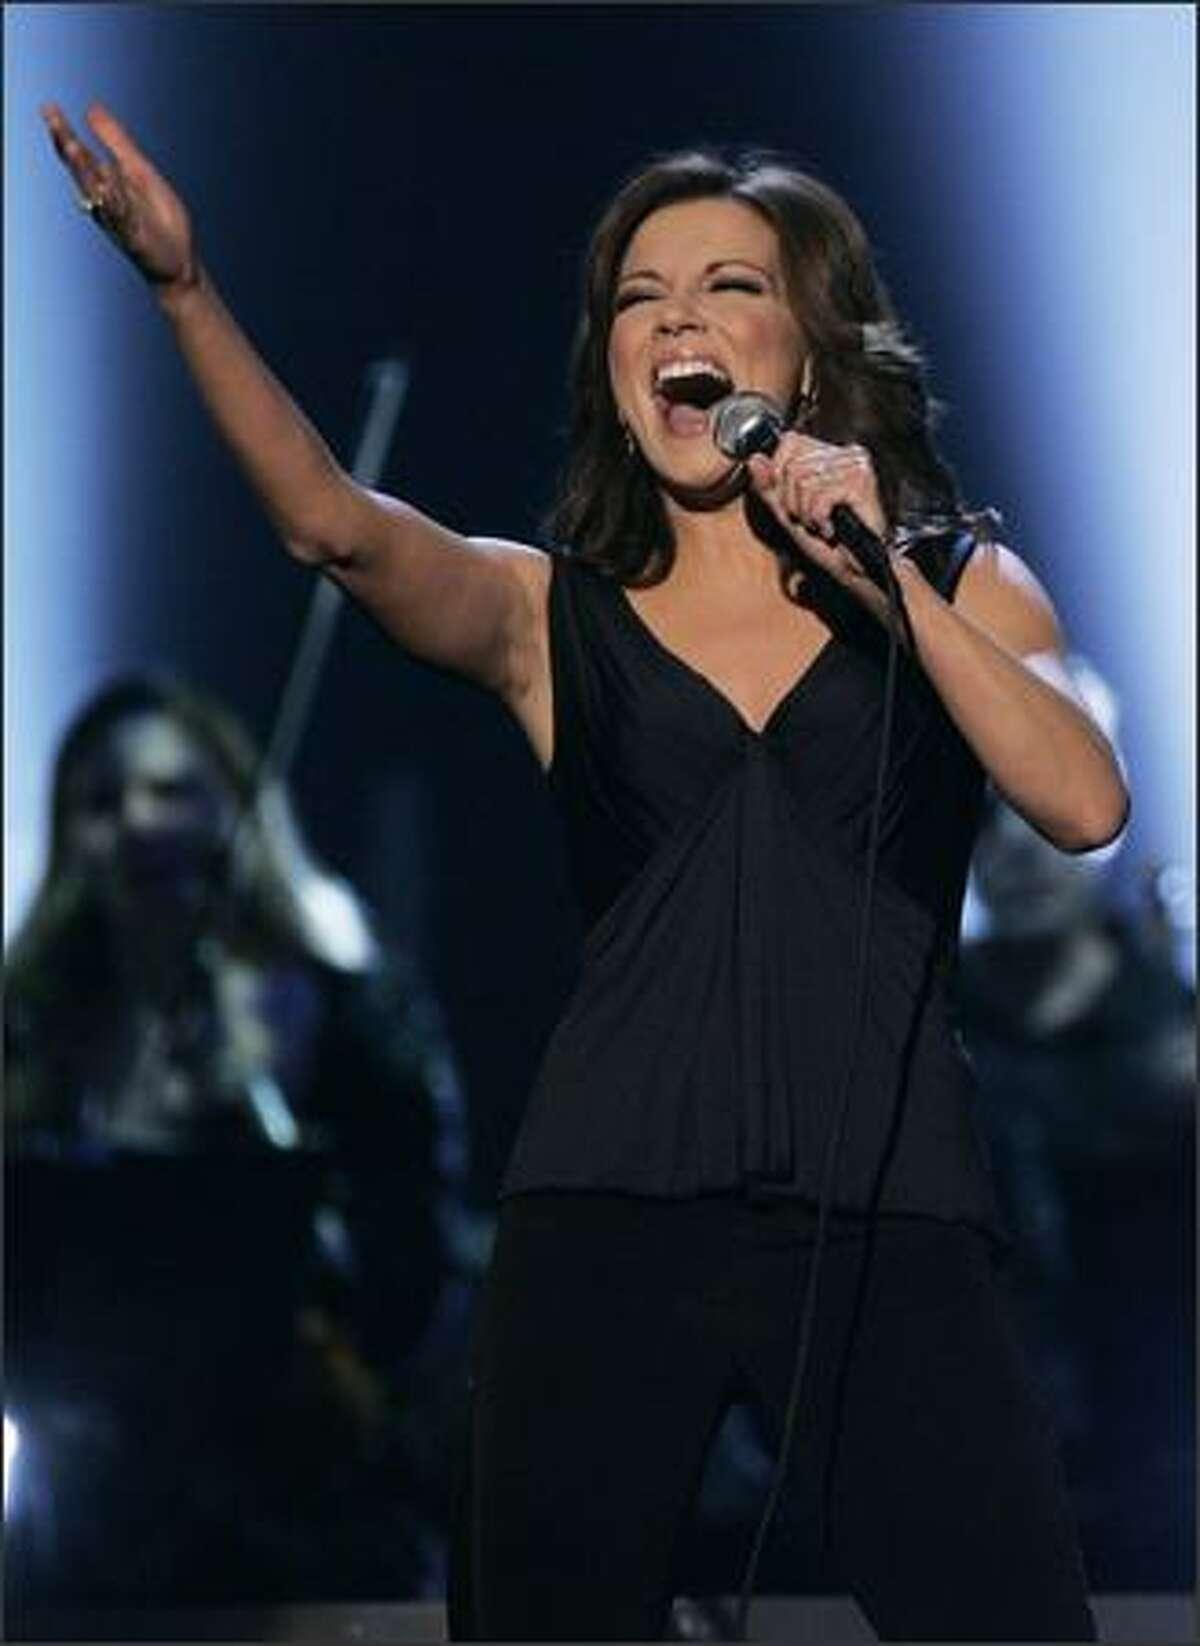 Martina McBride performs at the 40th Annual CMA Awards in Nashville, Tenn., on Monday. (AP Photo/Mark Humphrey)